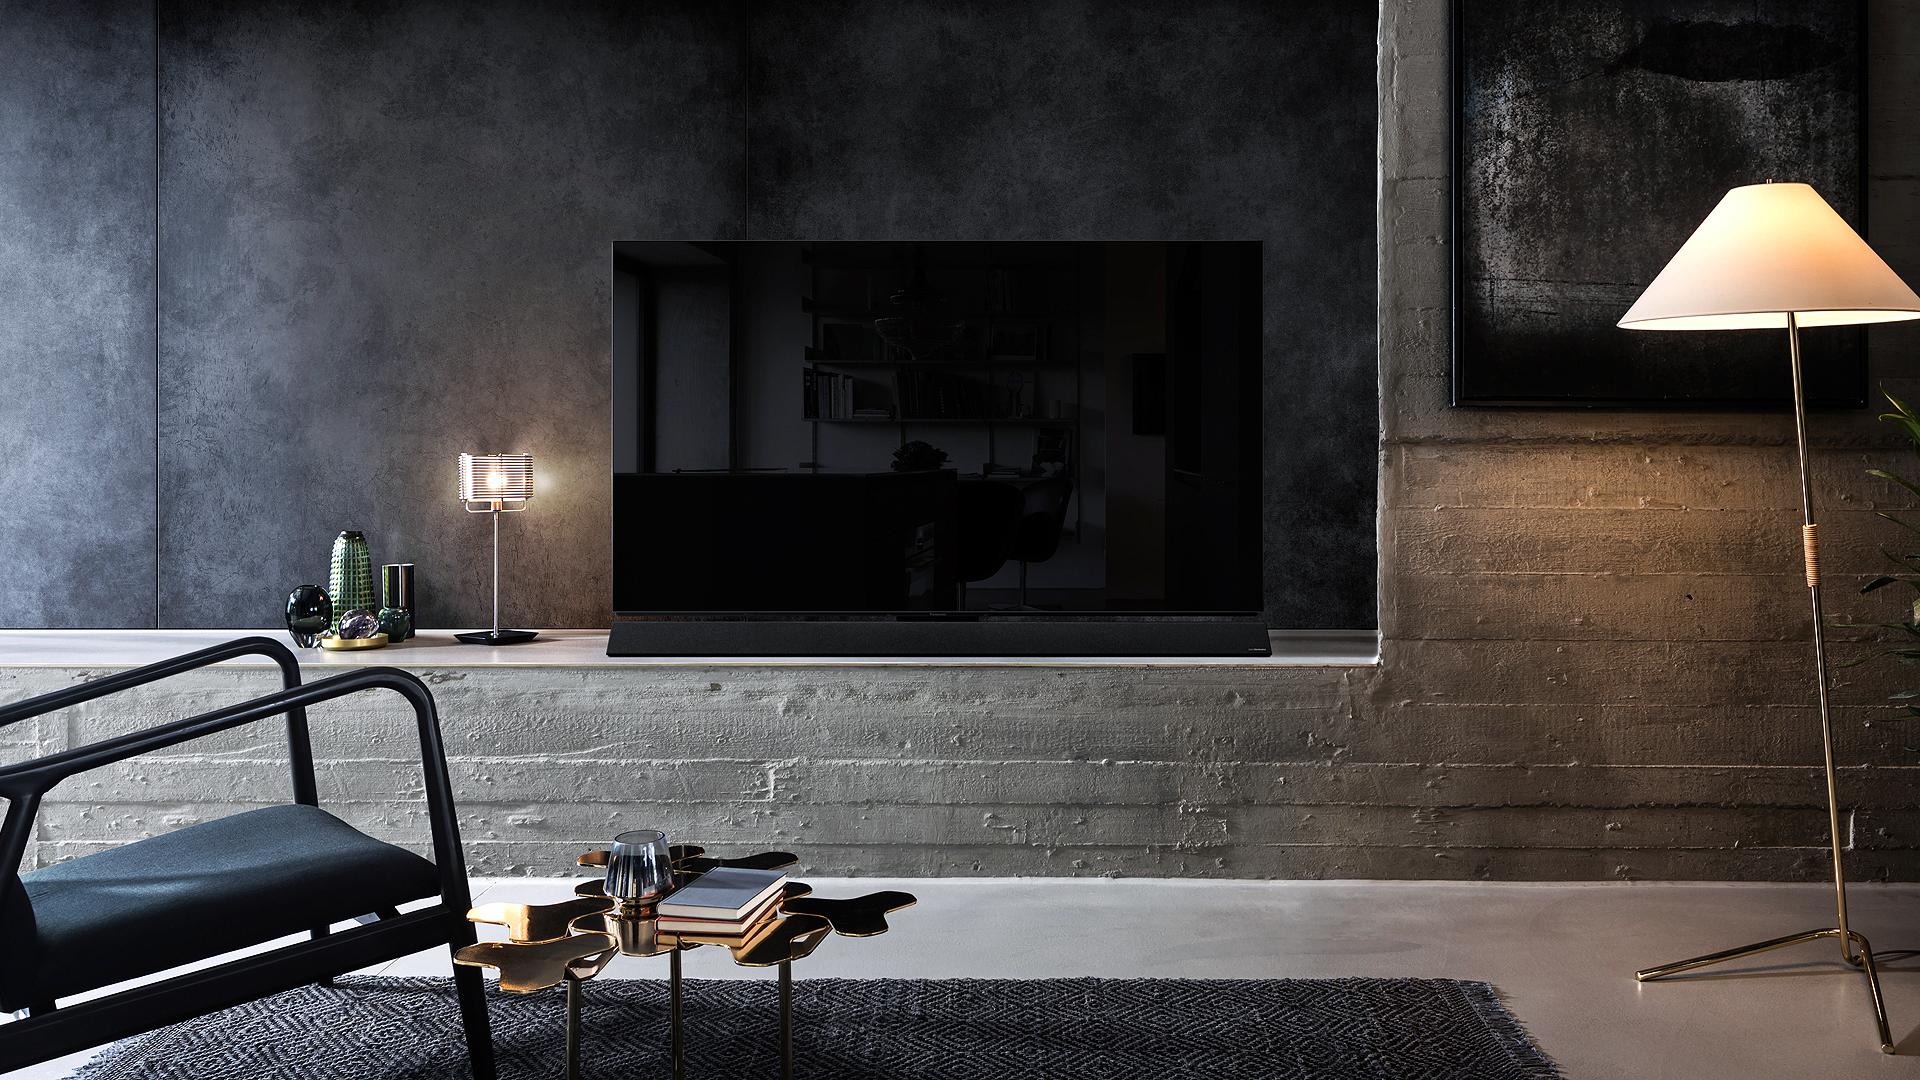 Panasonic TX-55FZ952B (FZ952) review: Hollywood-tuned 4K HDR OLED TV